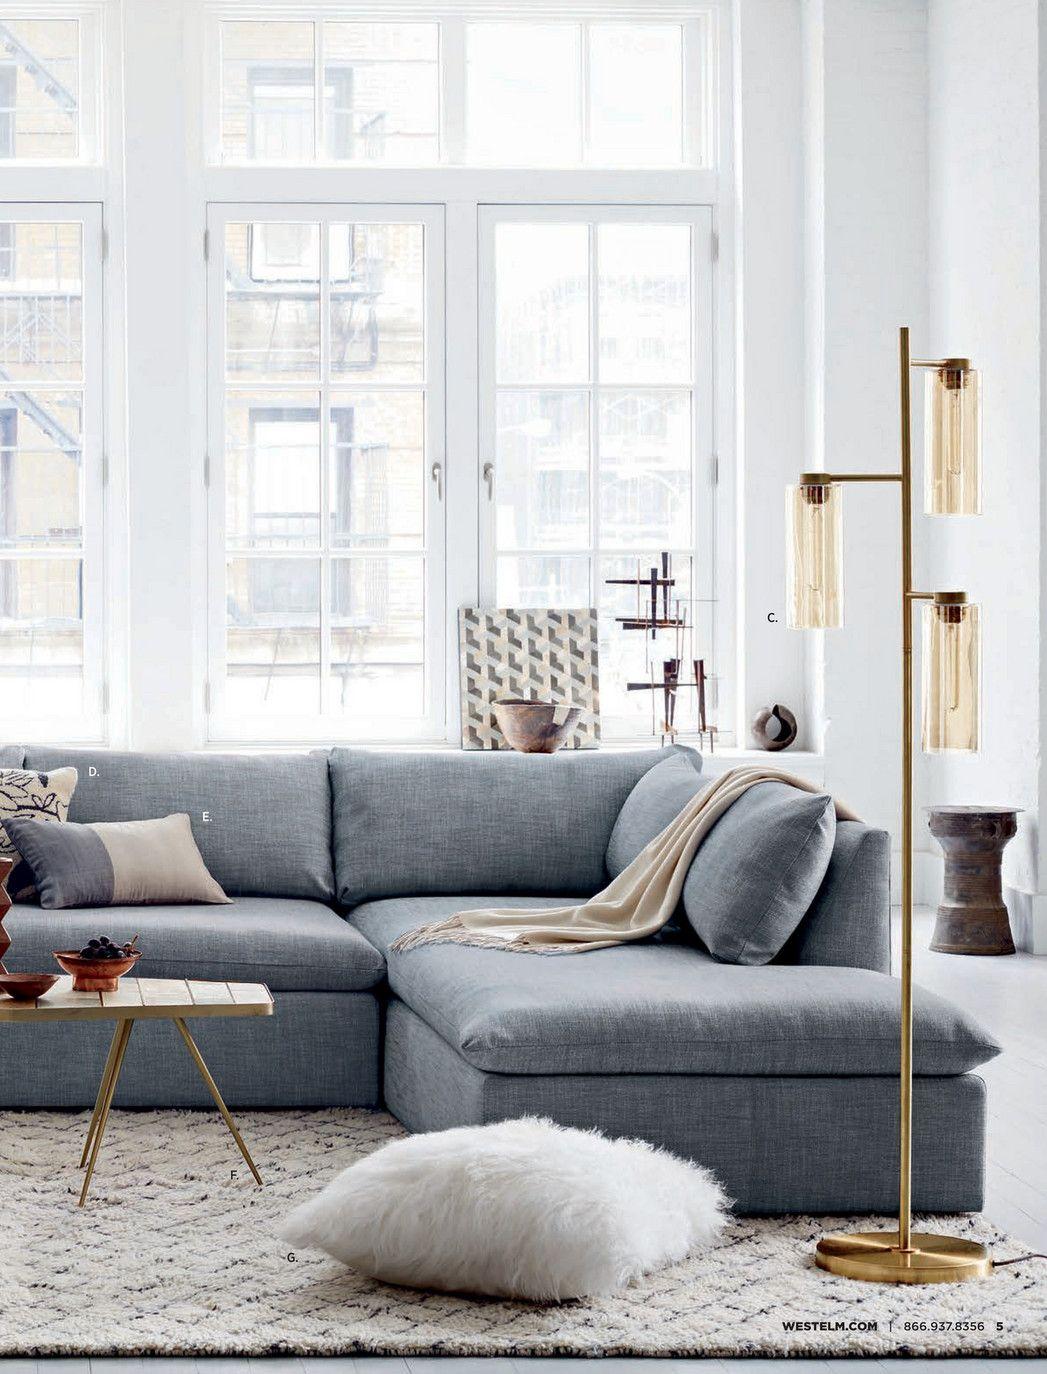 small sectional sofa west elm laura ashley montgomery shelter insides 43 outsides pinterest